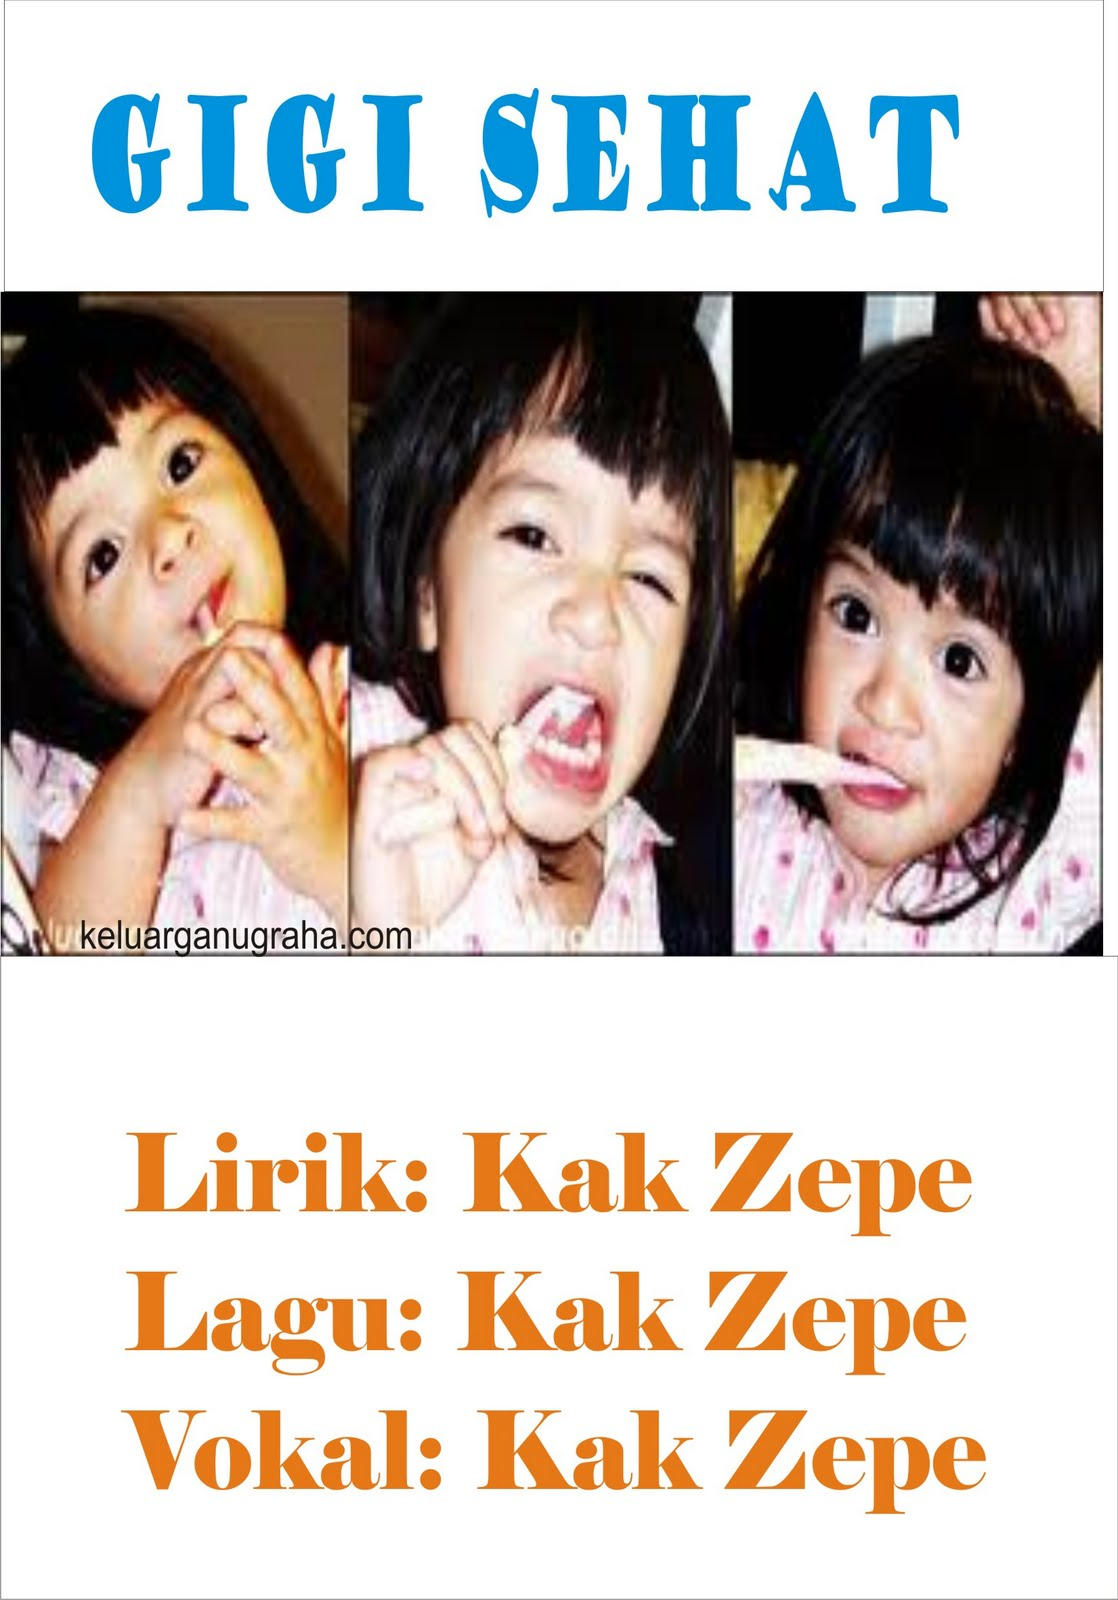 Gigi sehat, Lagu Anak Karya Kak Zepe (Lagu tentang kesehatan, Lagu